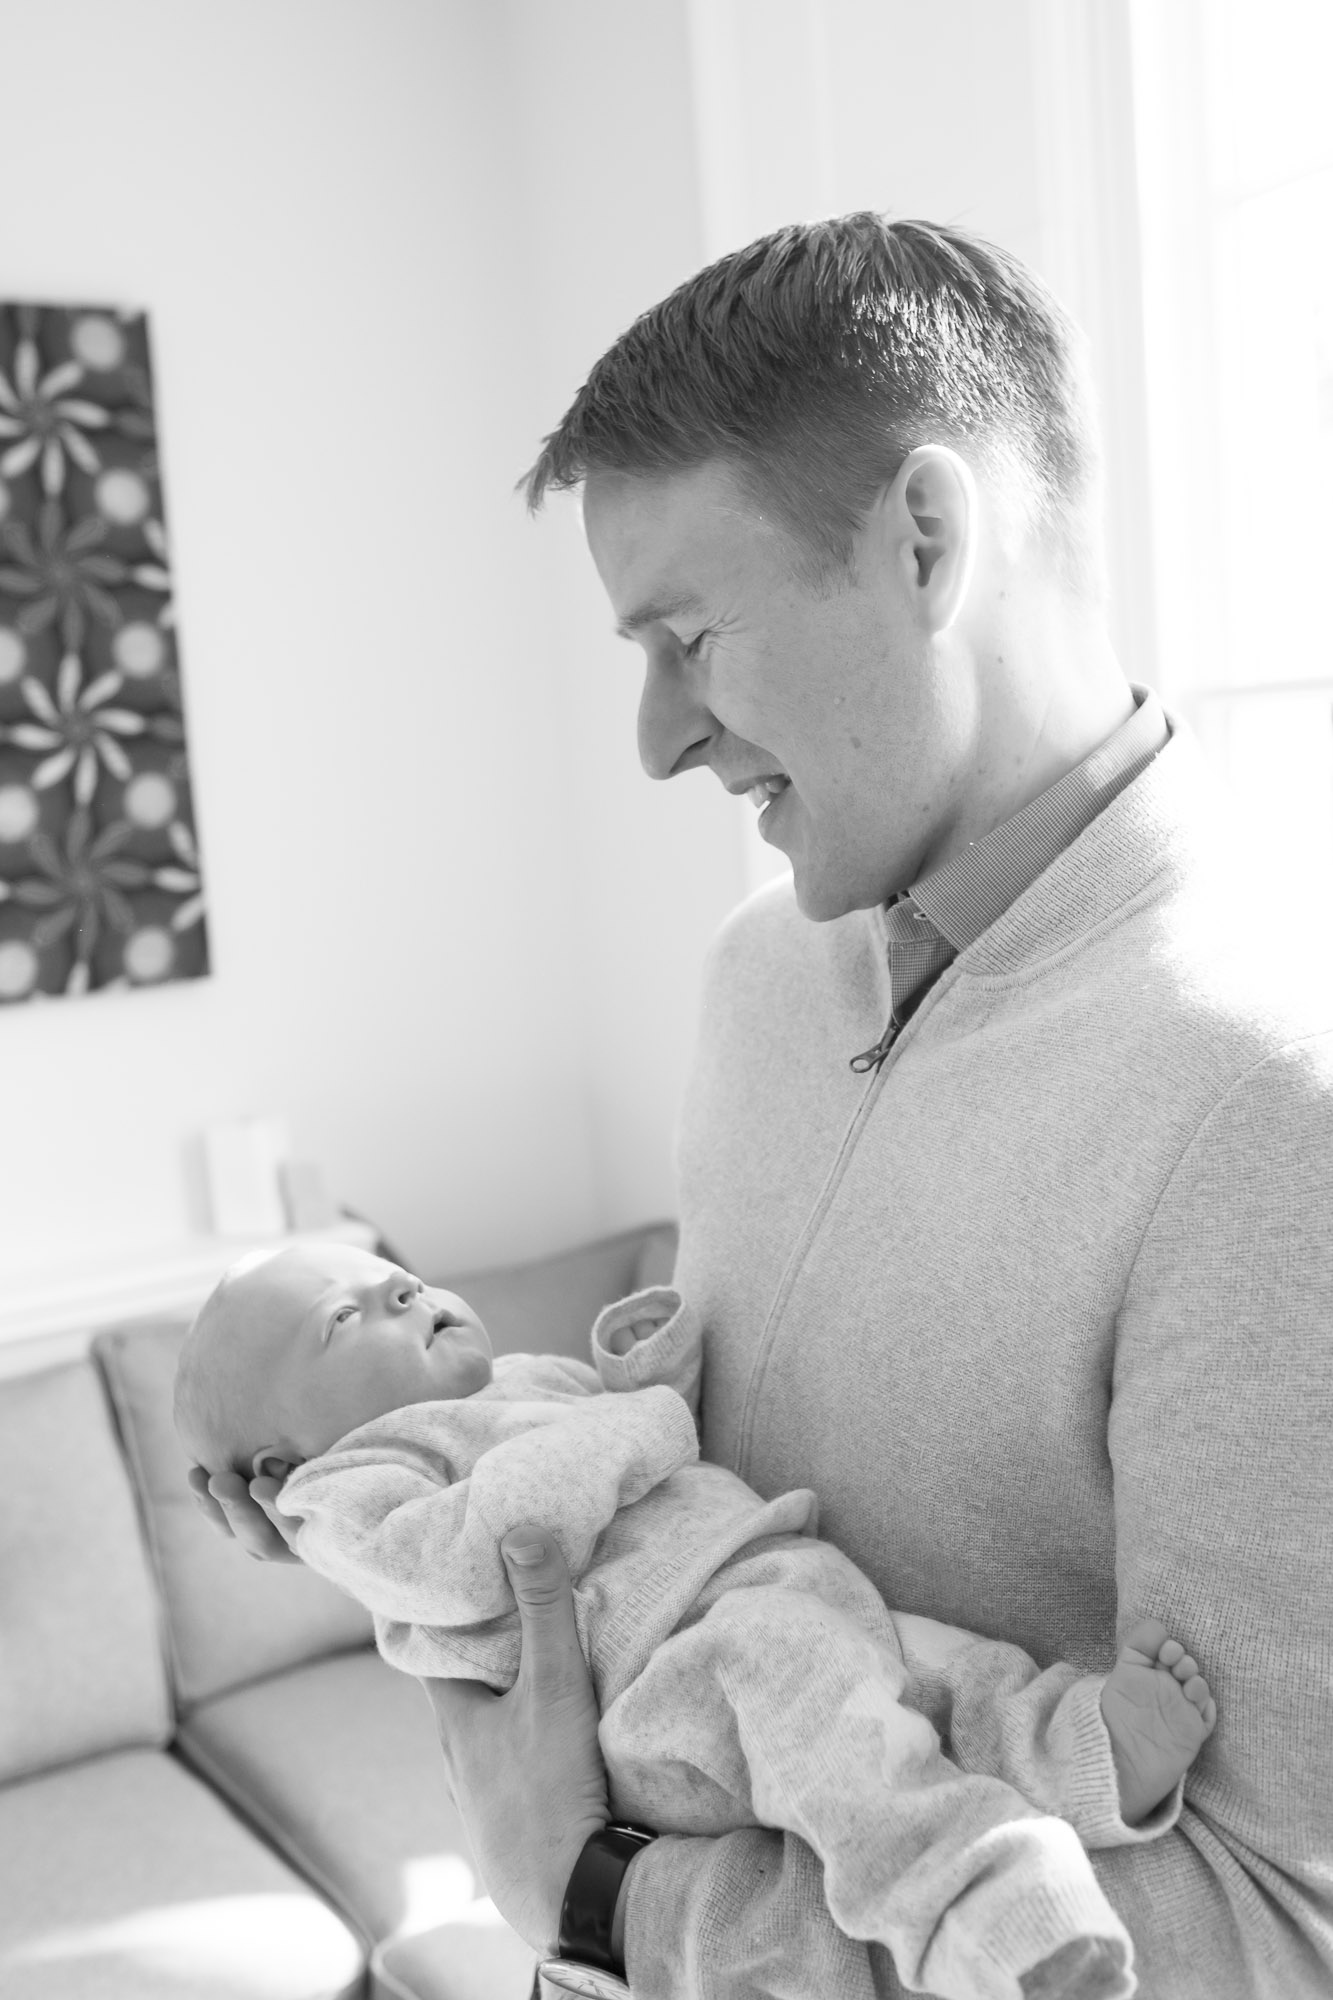 newborn-baby-family-portrait-photographer-068.jpg